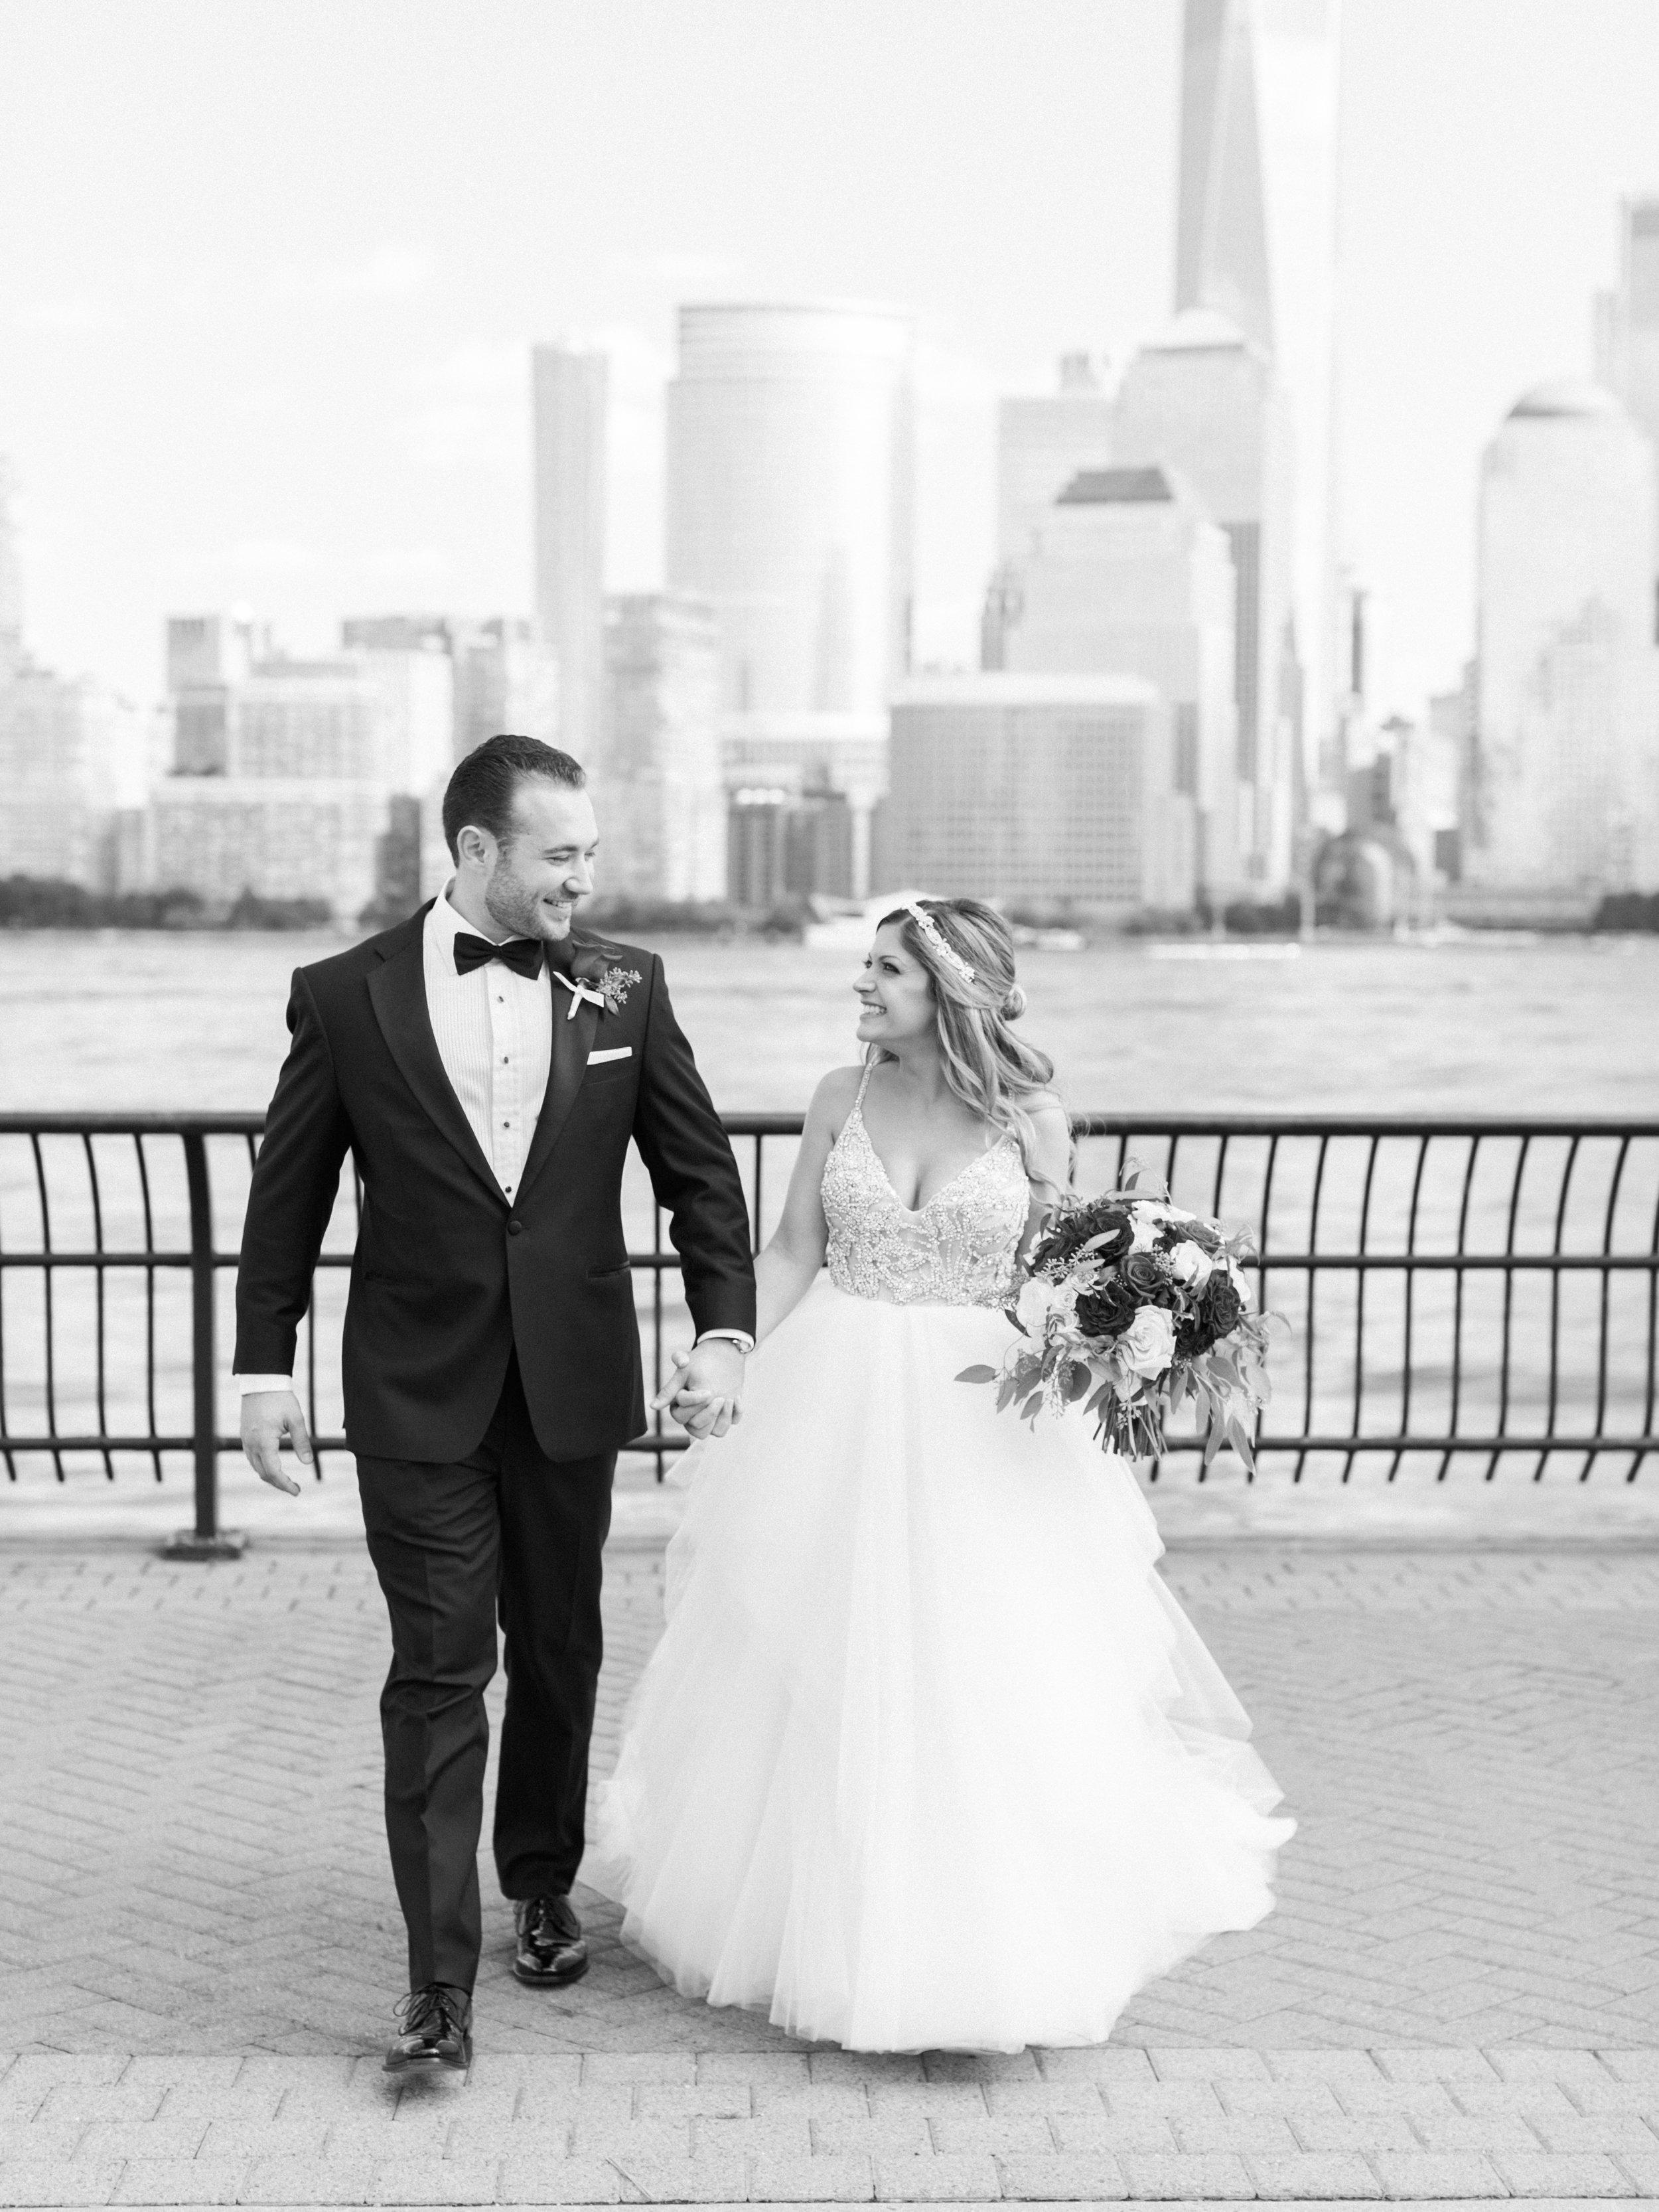 hyatt-regency-jersey-city-wedding-photographer23.jpg